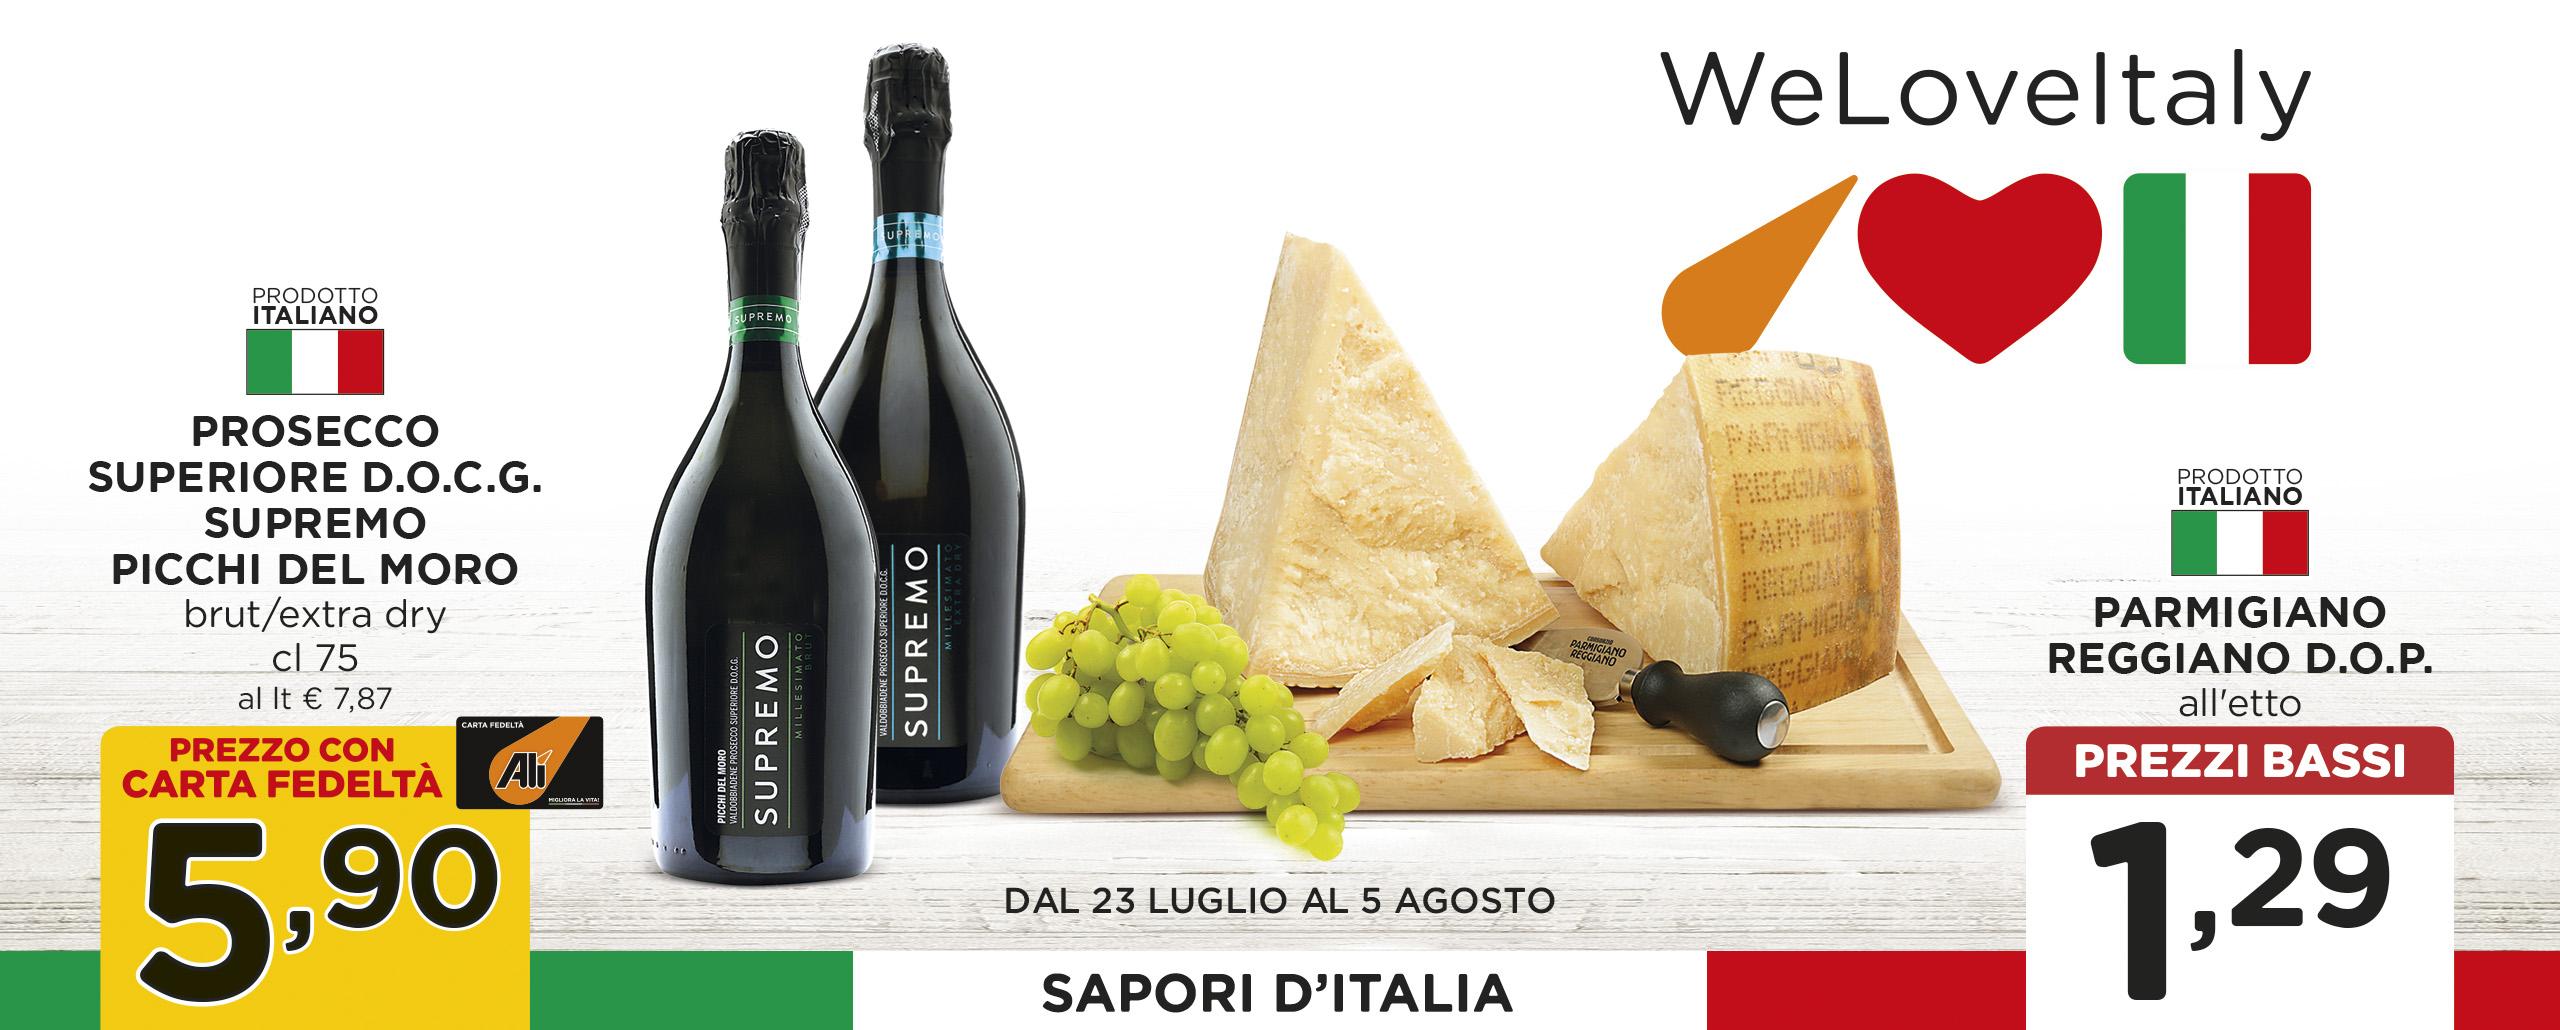 OS 15 - We Love Italy (sito)